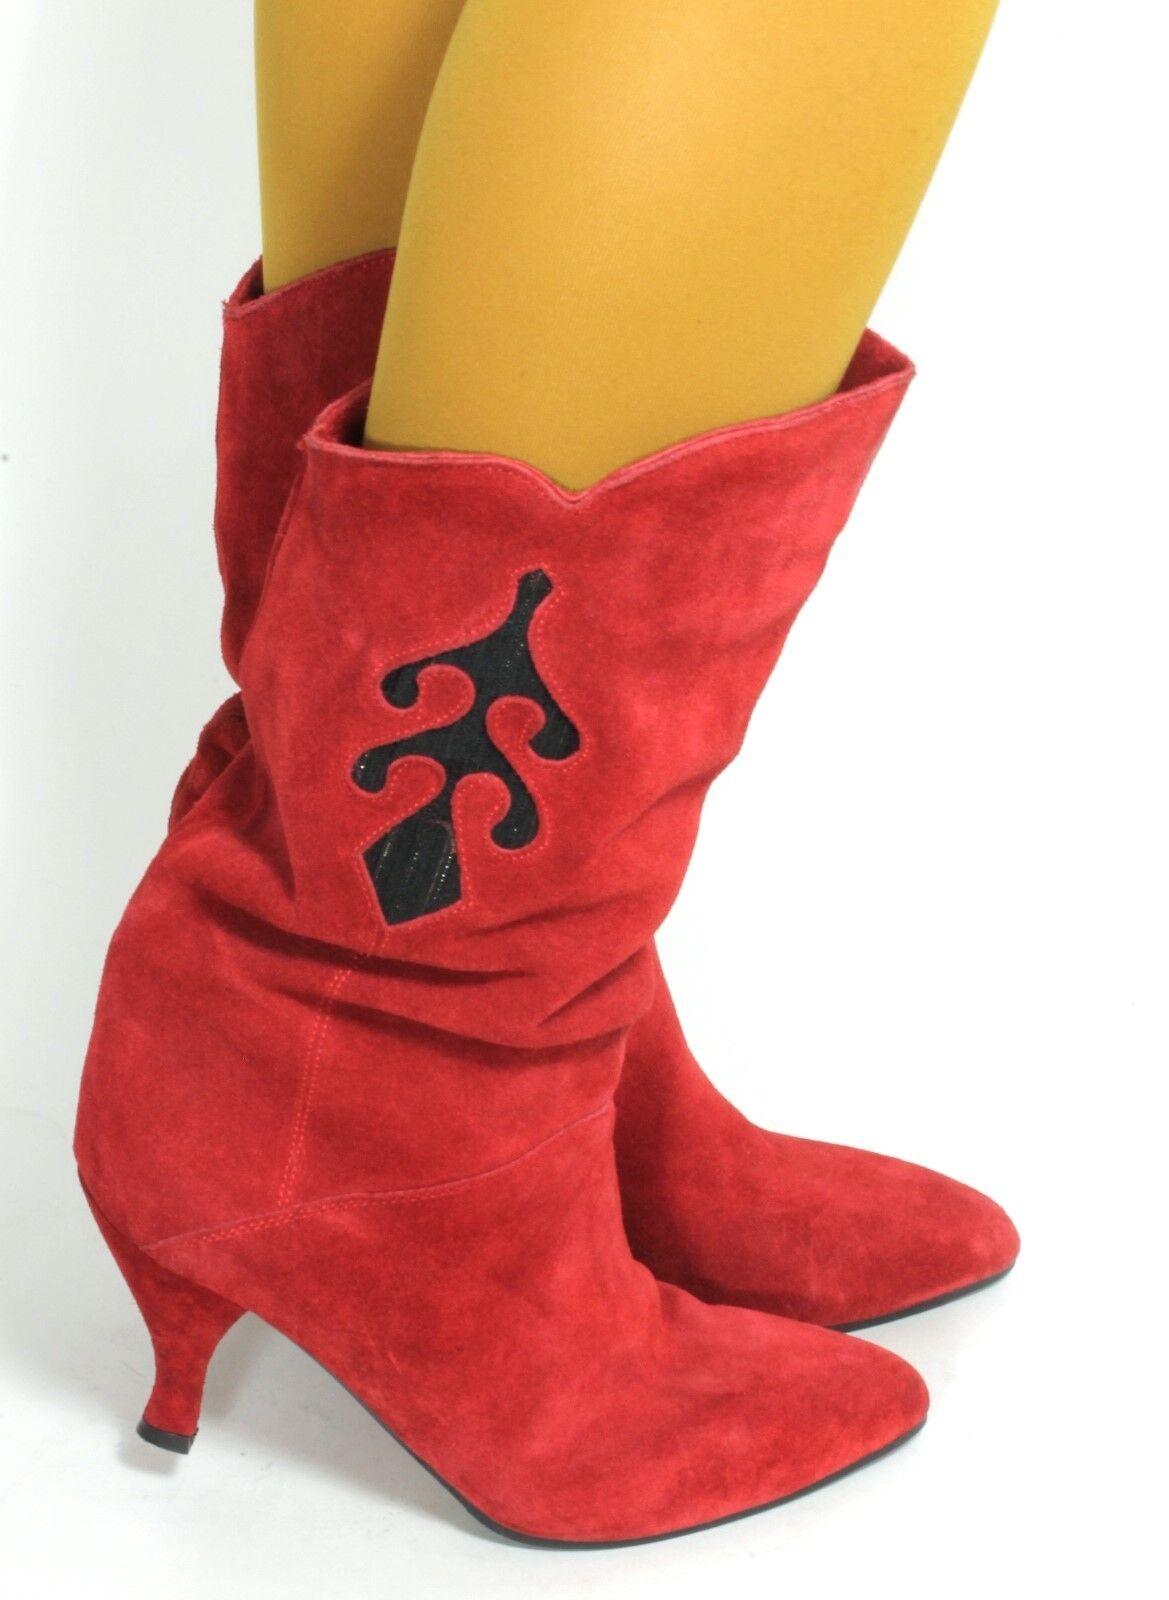 Damenstiefel Vintage Stiefel Stiefel Leder High Heels Rot Gold  41